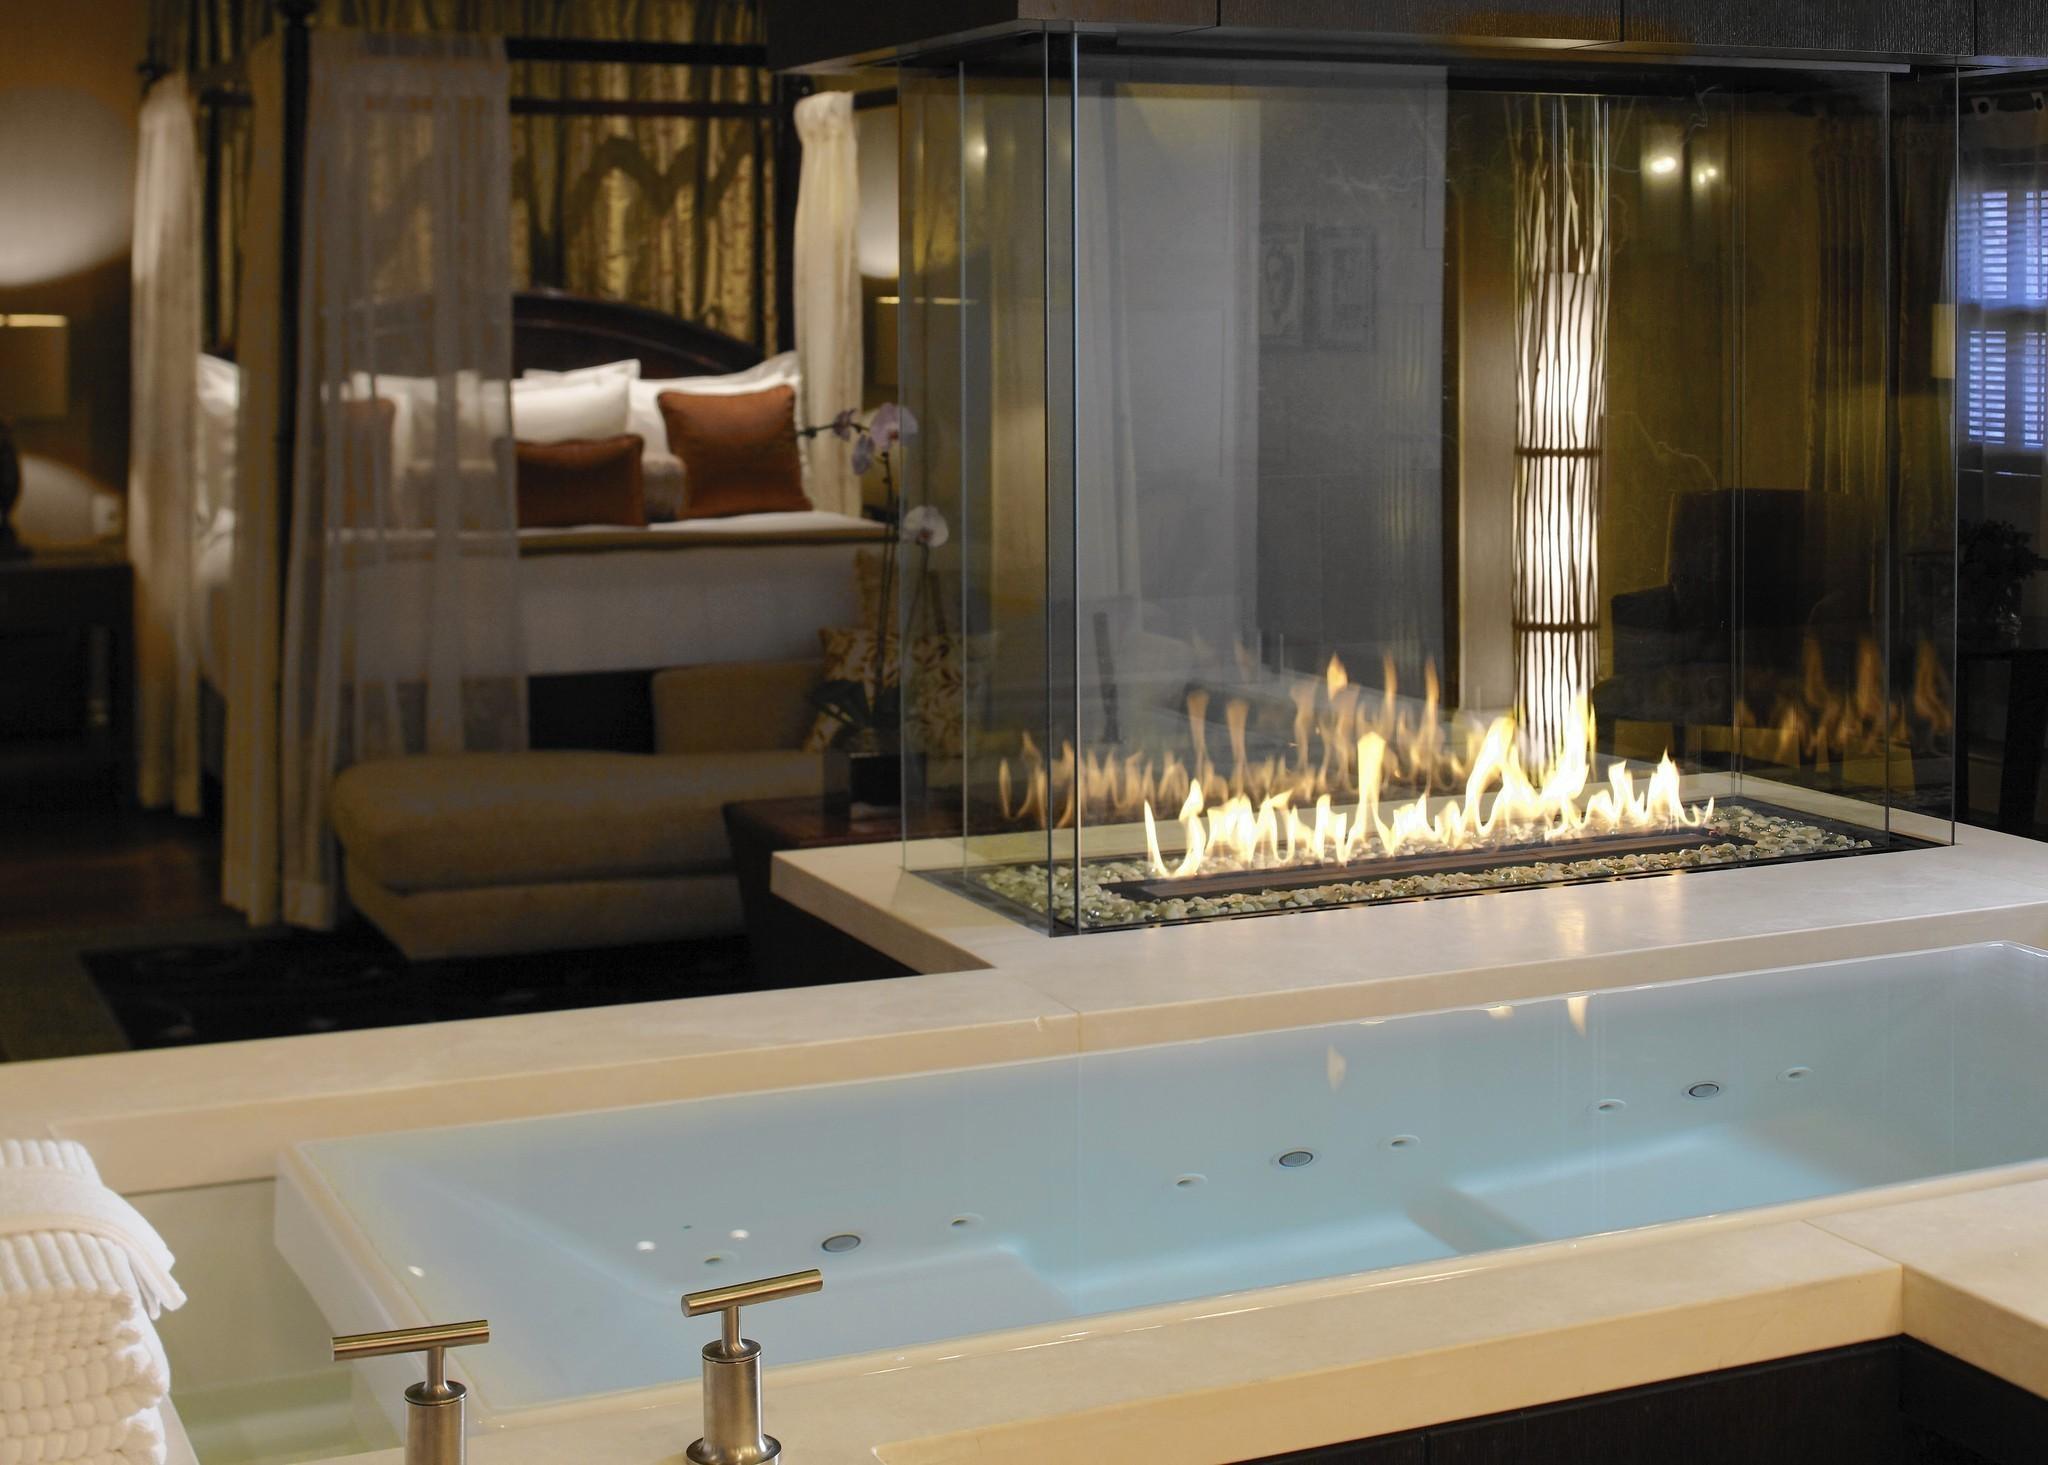 Kohler S Wisconsin Resort Provides Renovation Inspiration